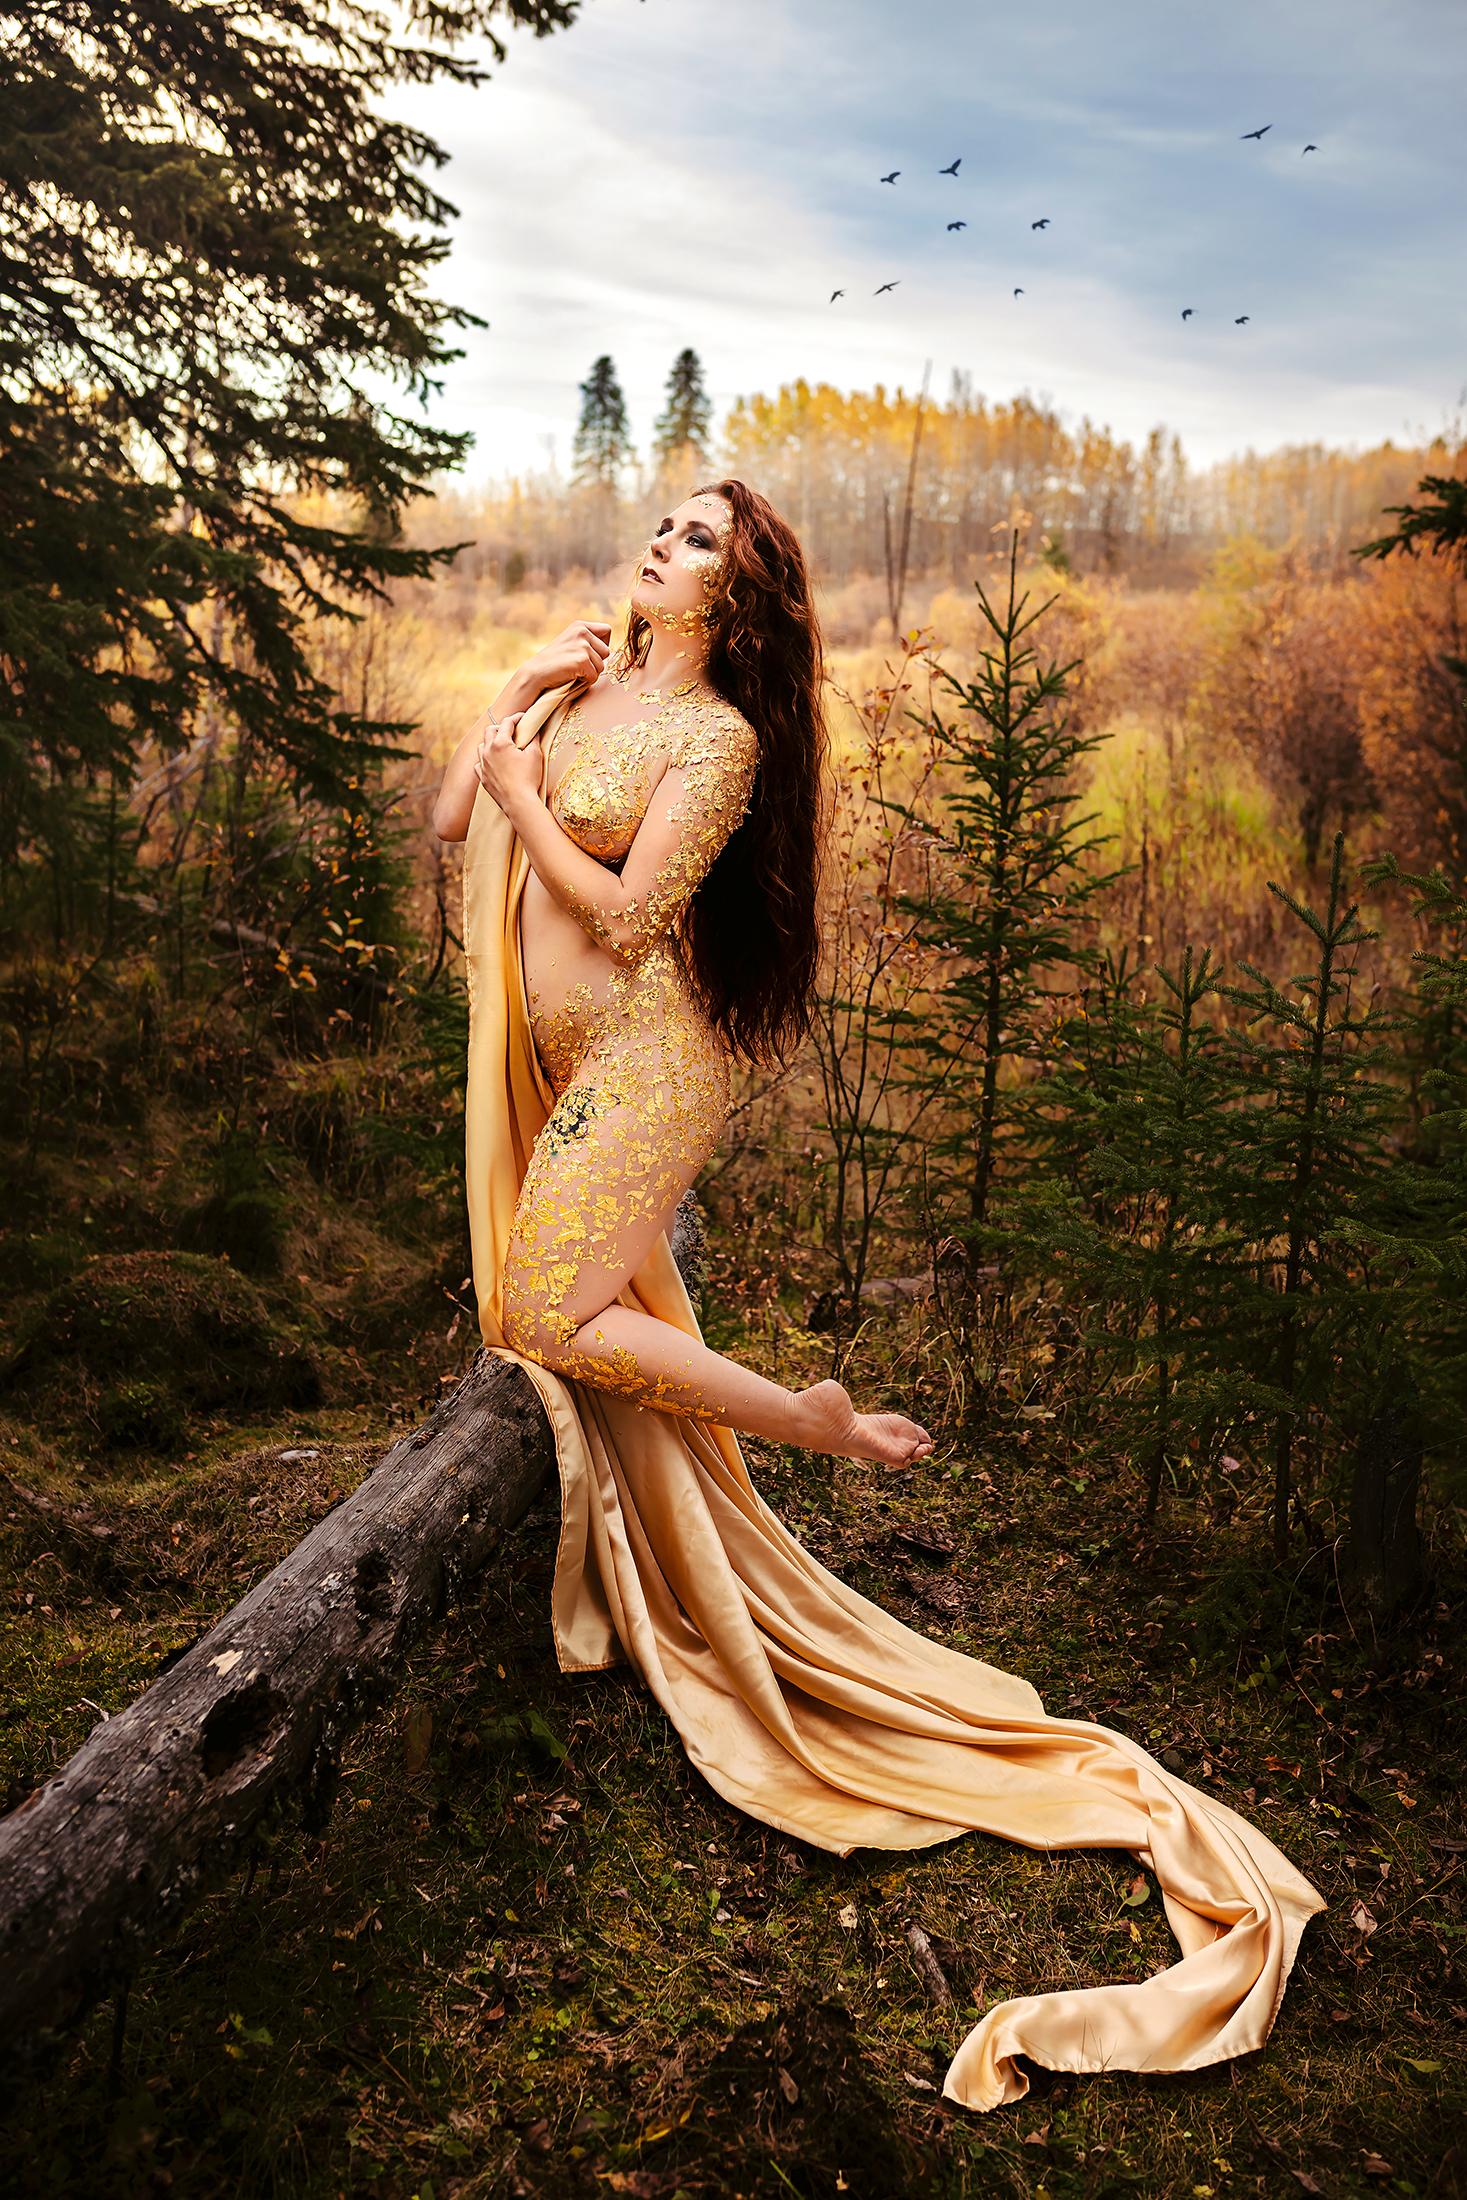 Fine art nude boudoir photographer gold leaf flake foil calgary red deer cochrane airdrie innisfail alberta